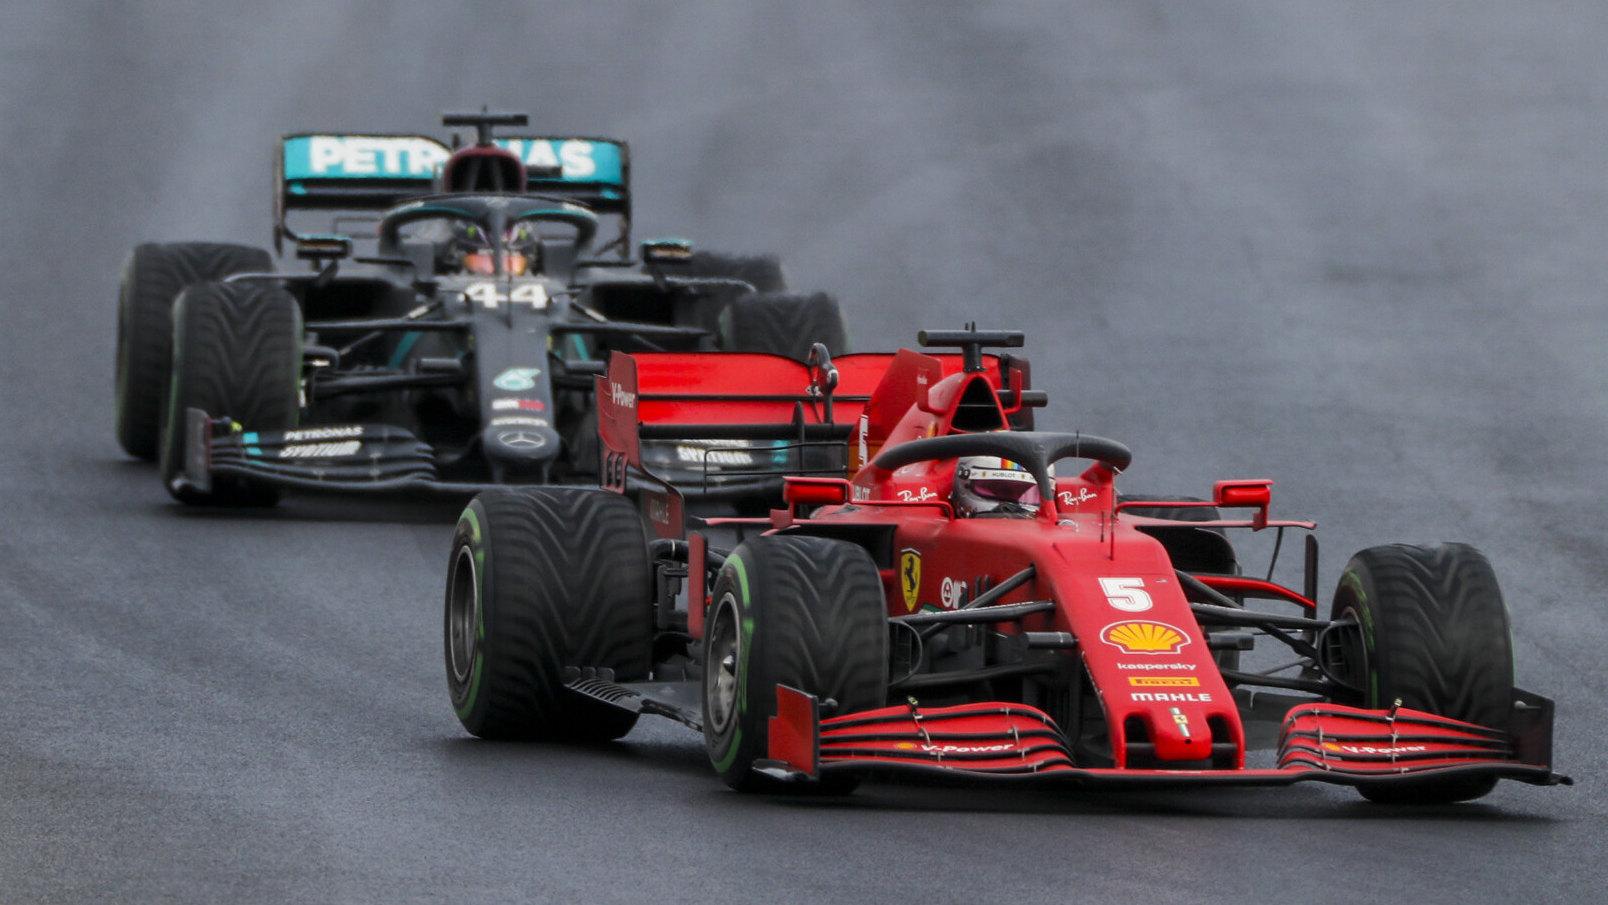 Formel 1 Archiv